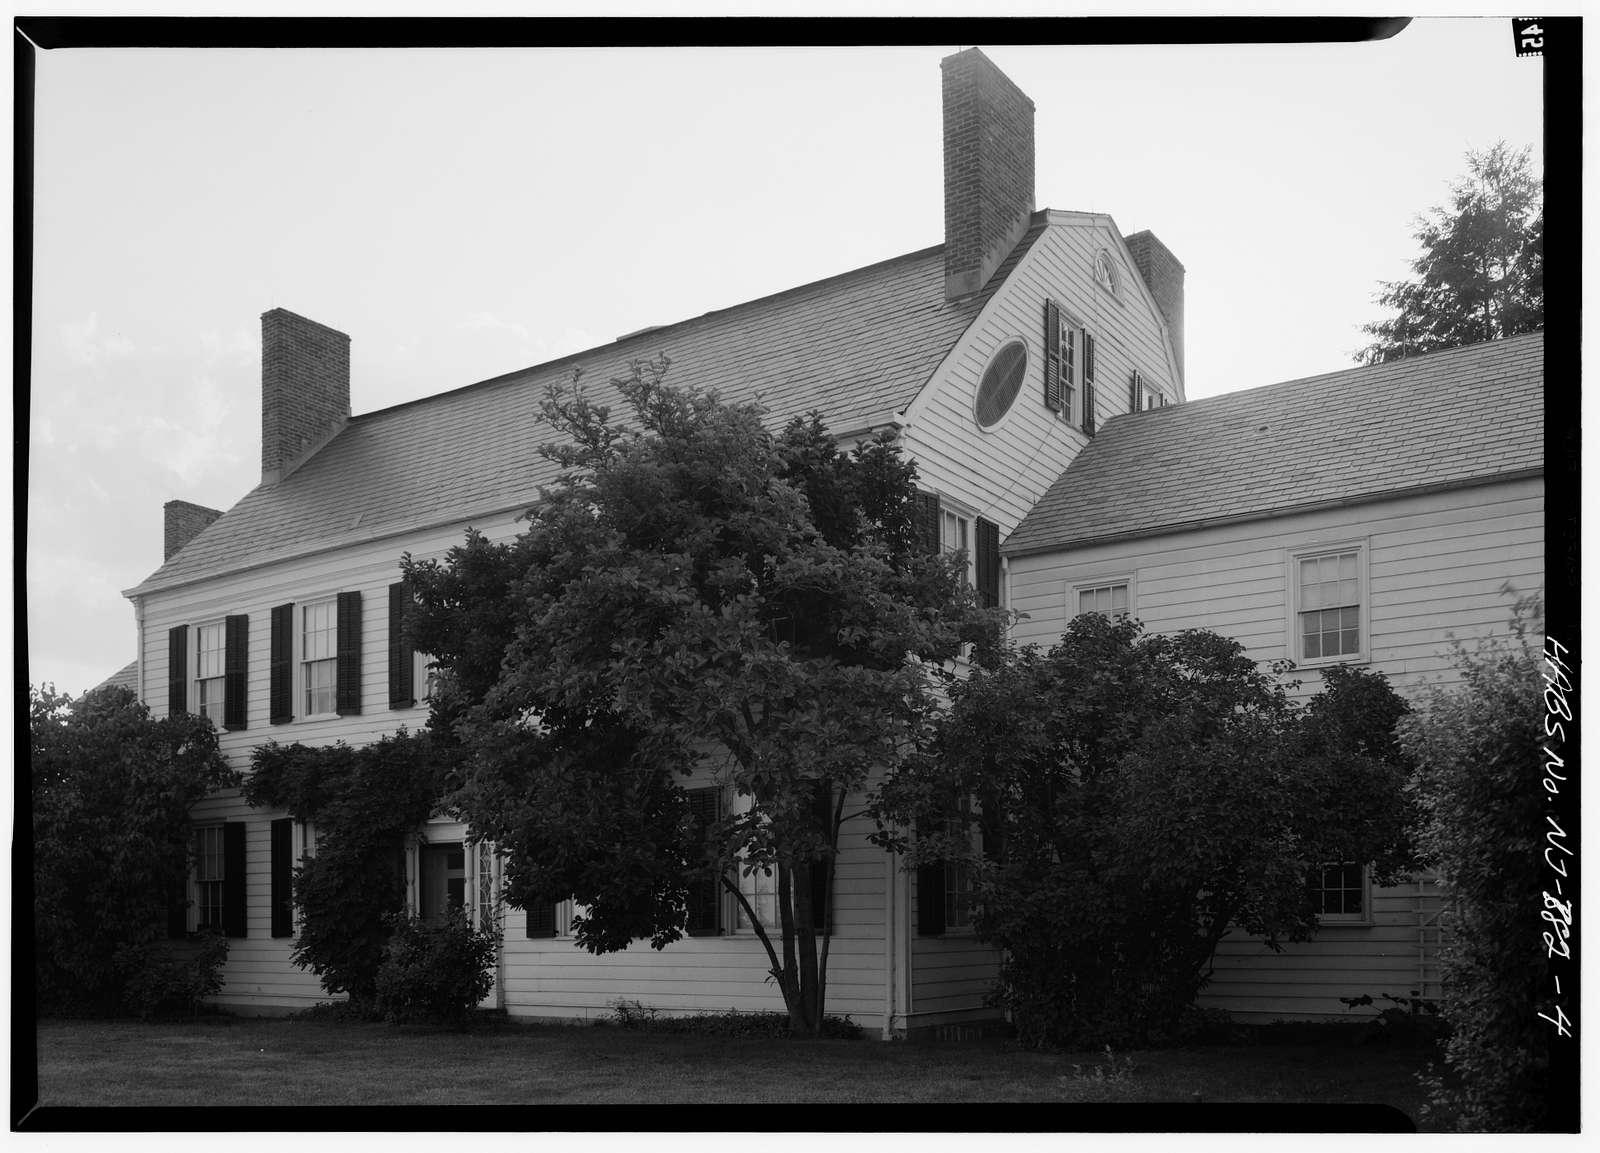 Henry Miller House, Main Street, Oldwick, Hunterdon County, NJ